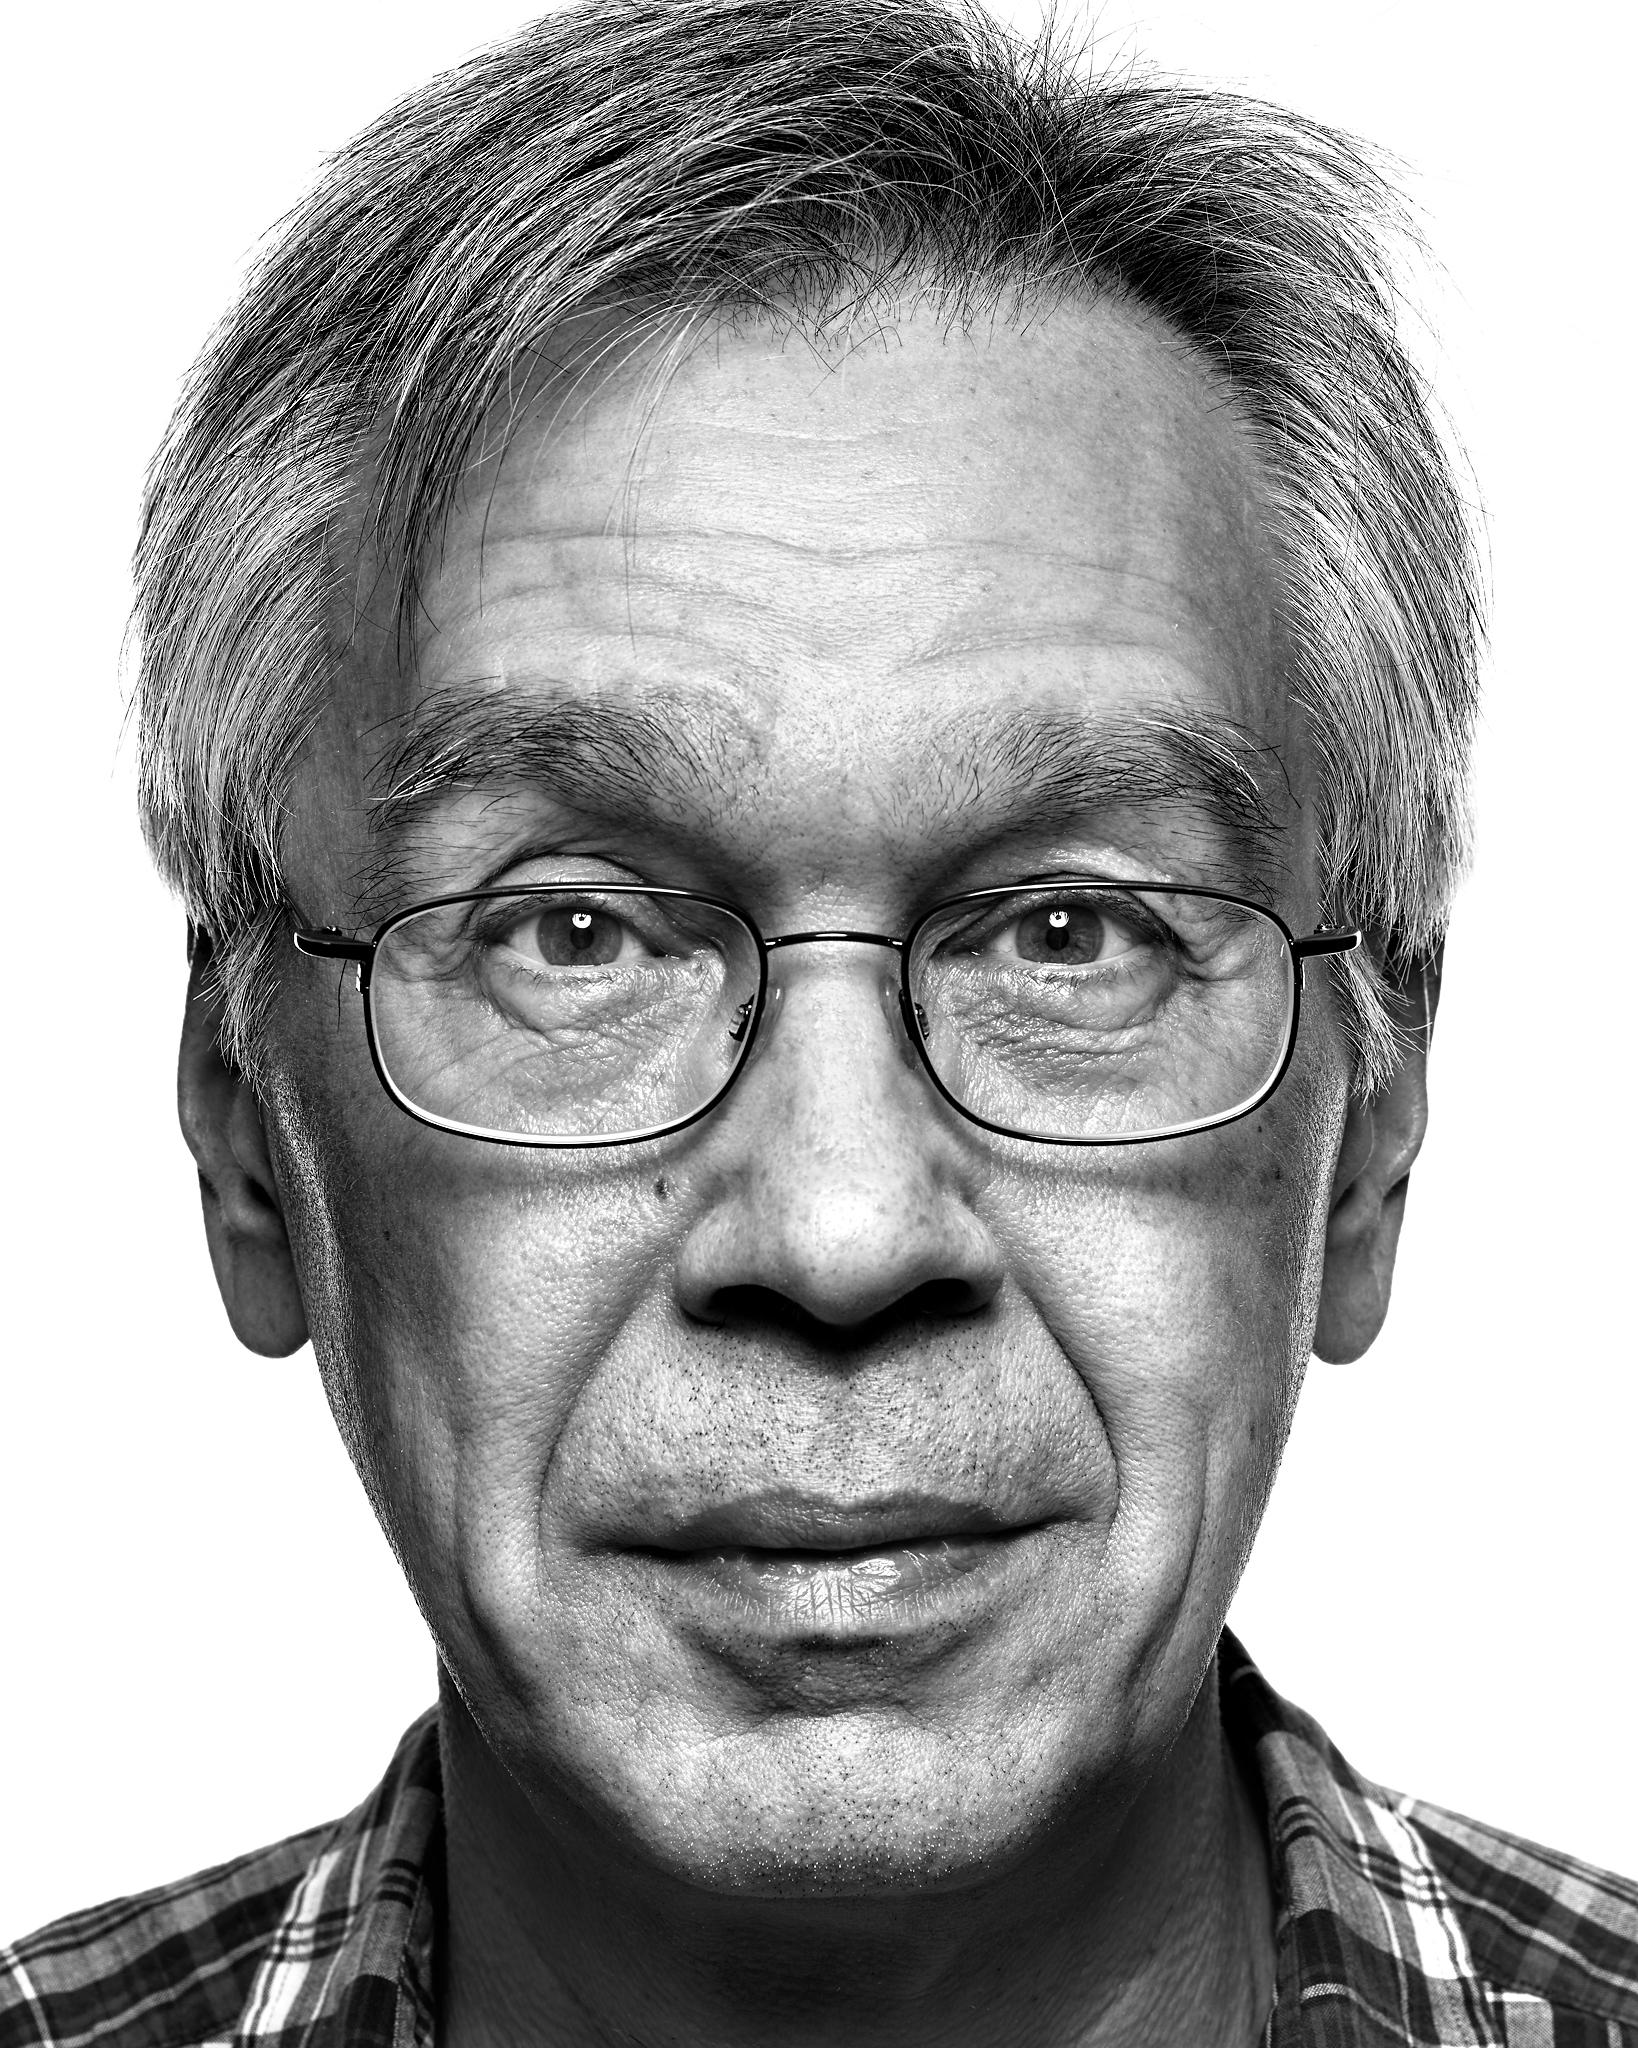 Wietse Venema by Peter Adams.